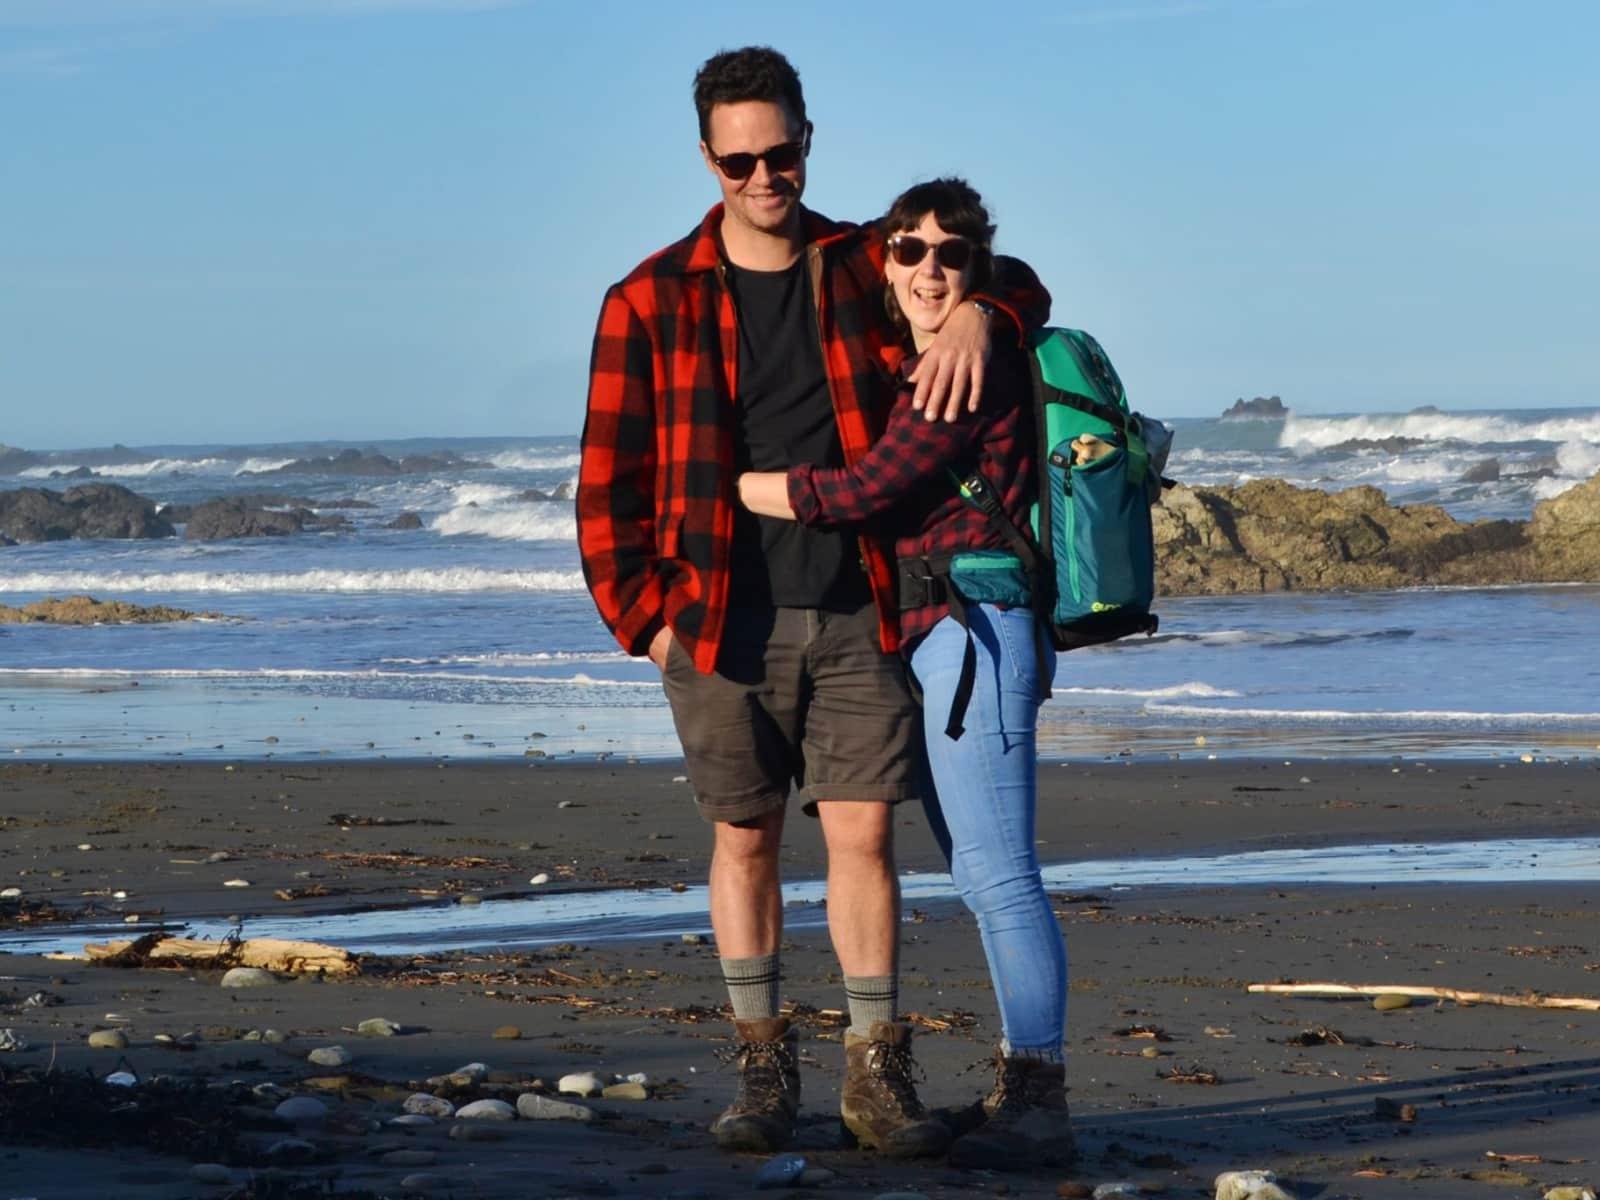 Sarah & Owen from Wellington, New Zealand